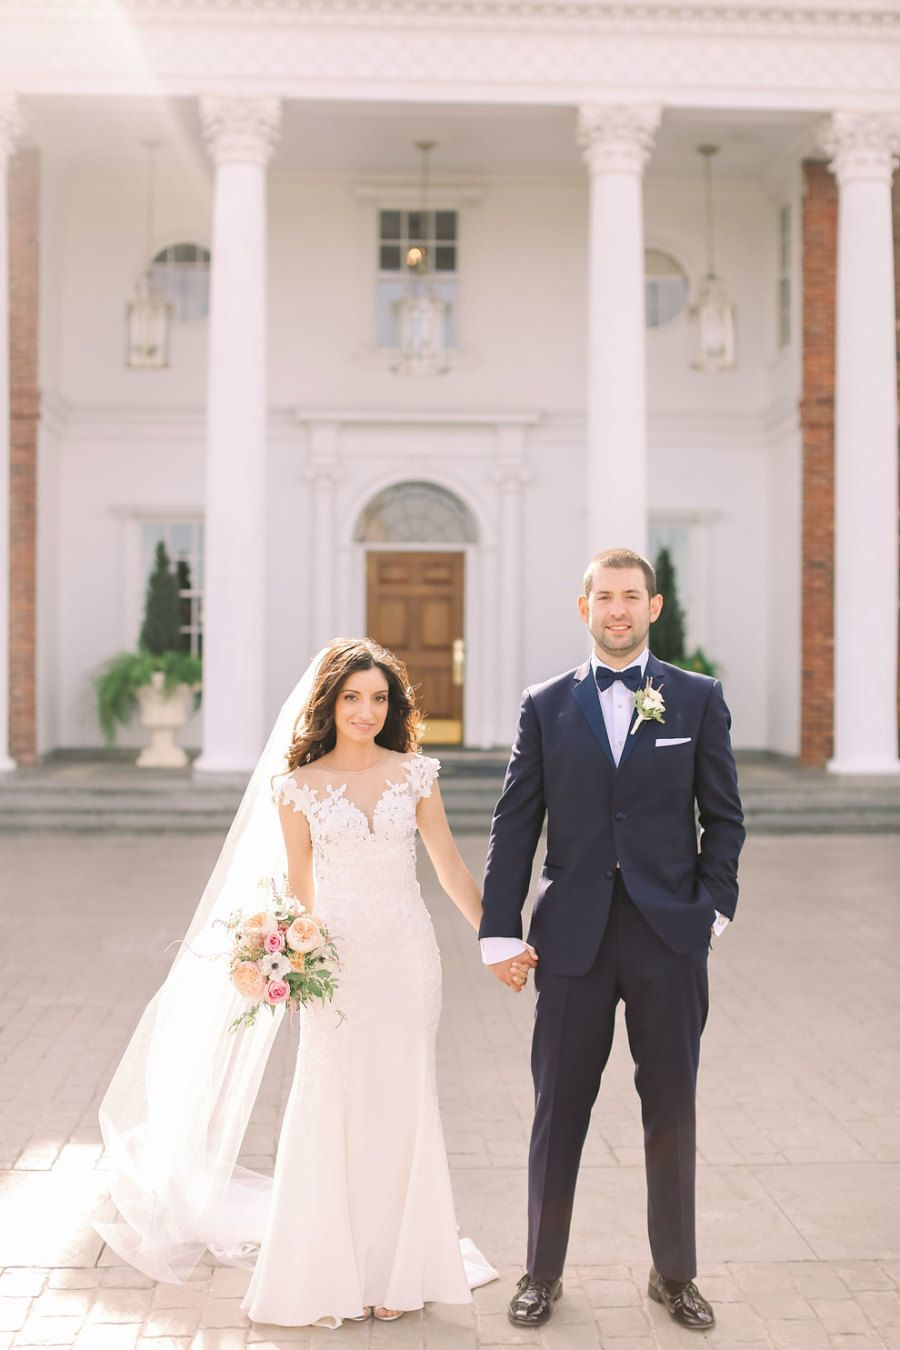 New jersey wedding crashed by donald trump mark zunino and